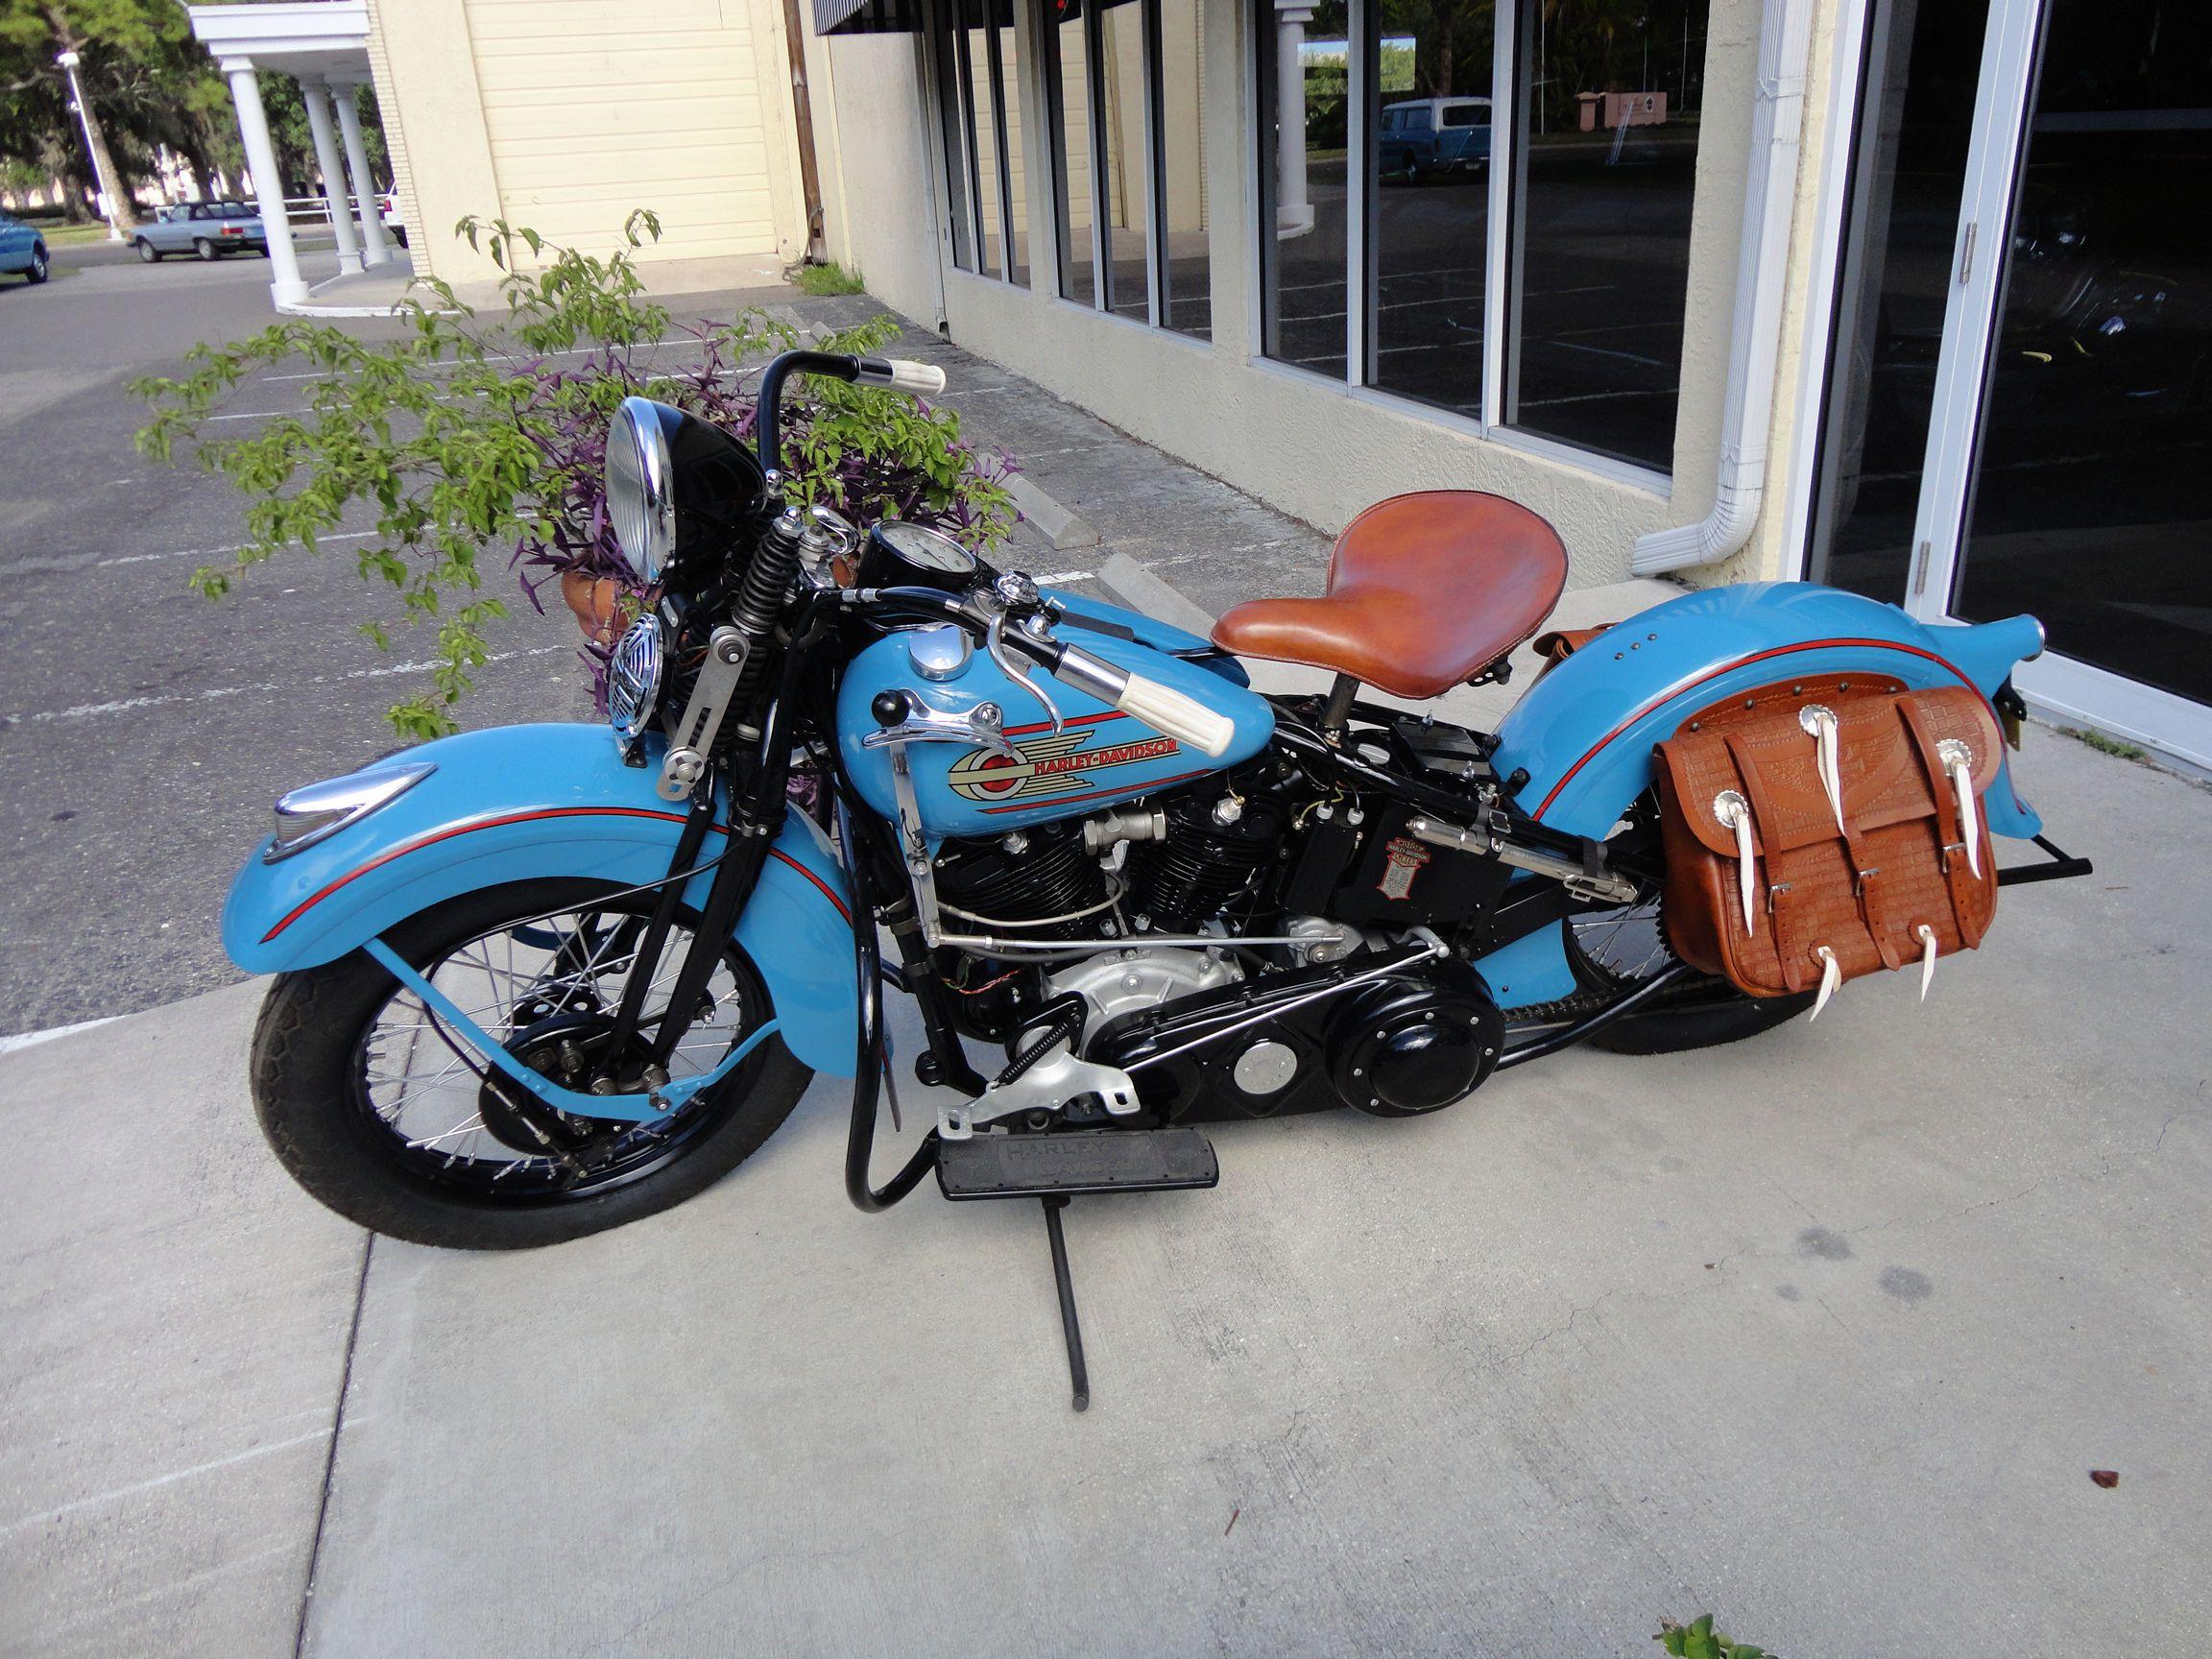 1938 Harley Davidson Knucklehead With Images Vintage Harley